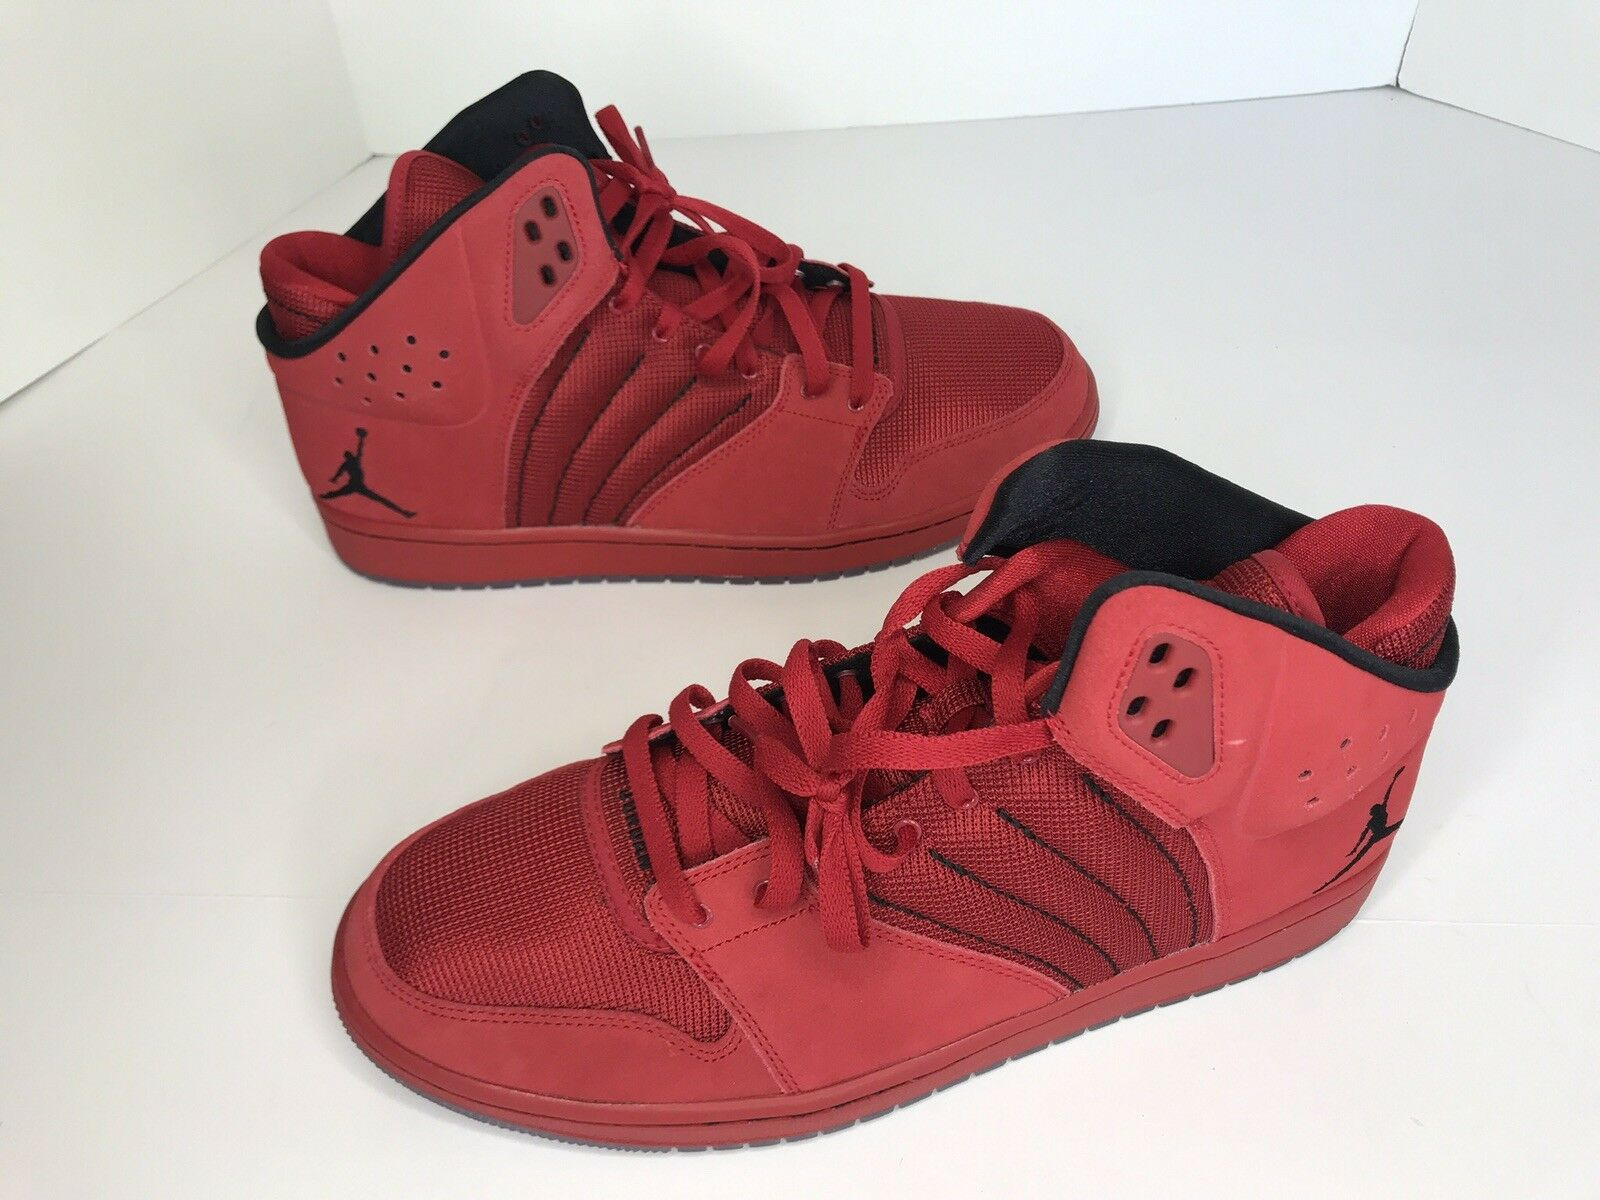 NIKE Jordan 1 Flight 4 Men Basketball shoes Size 13 Red Black 838818 600